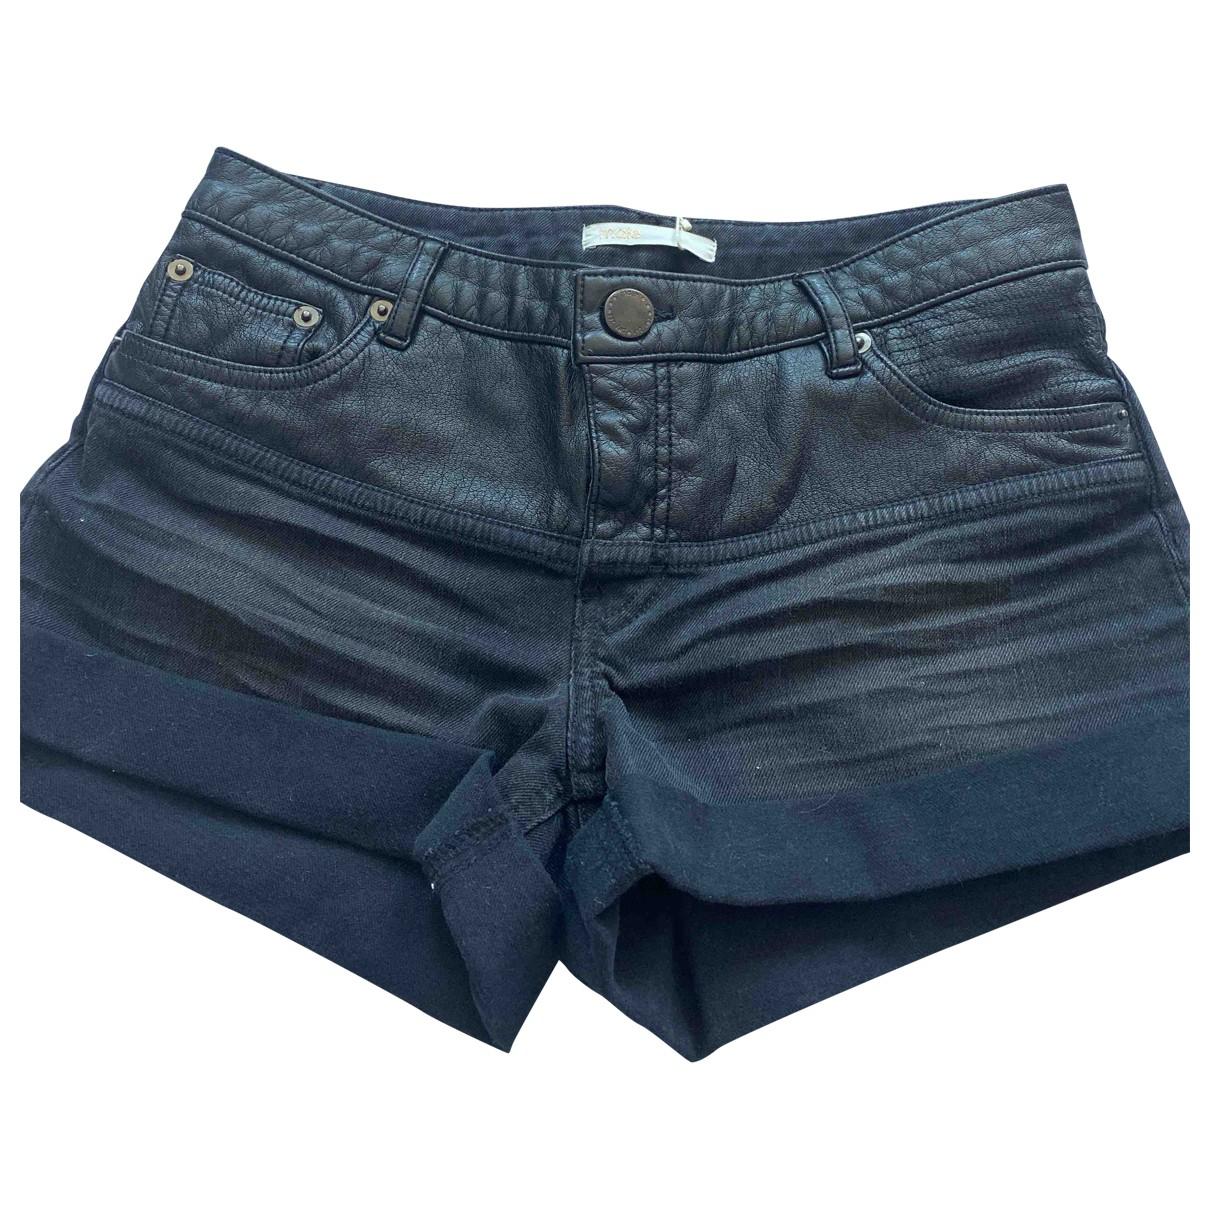 Maje Fall Winter 2019 Black Cotton Shorts for Women 36 FR